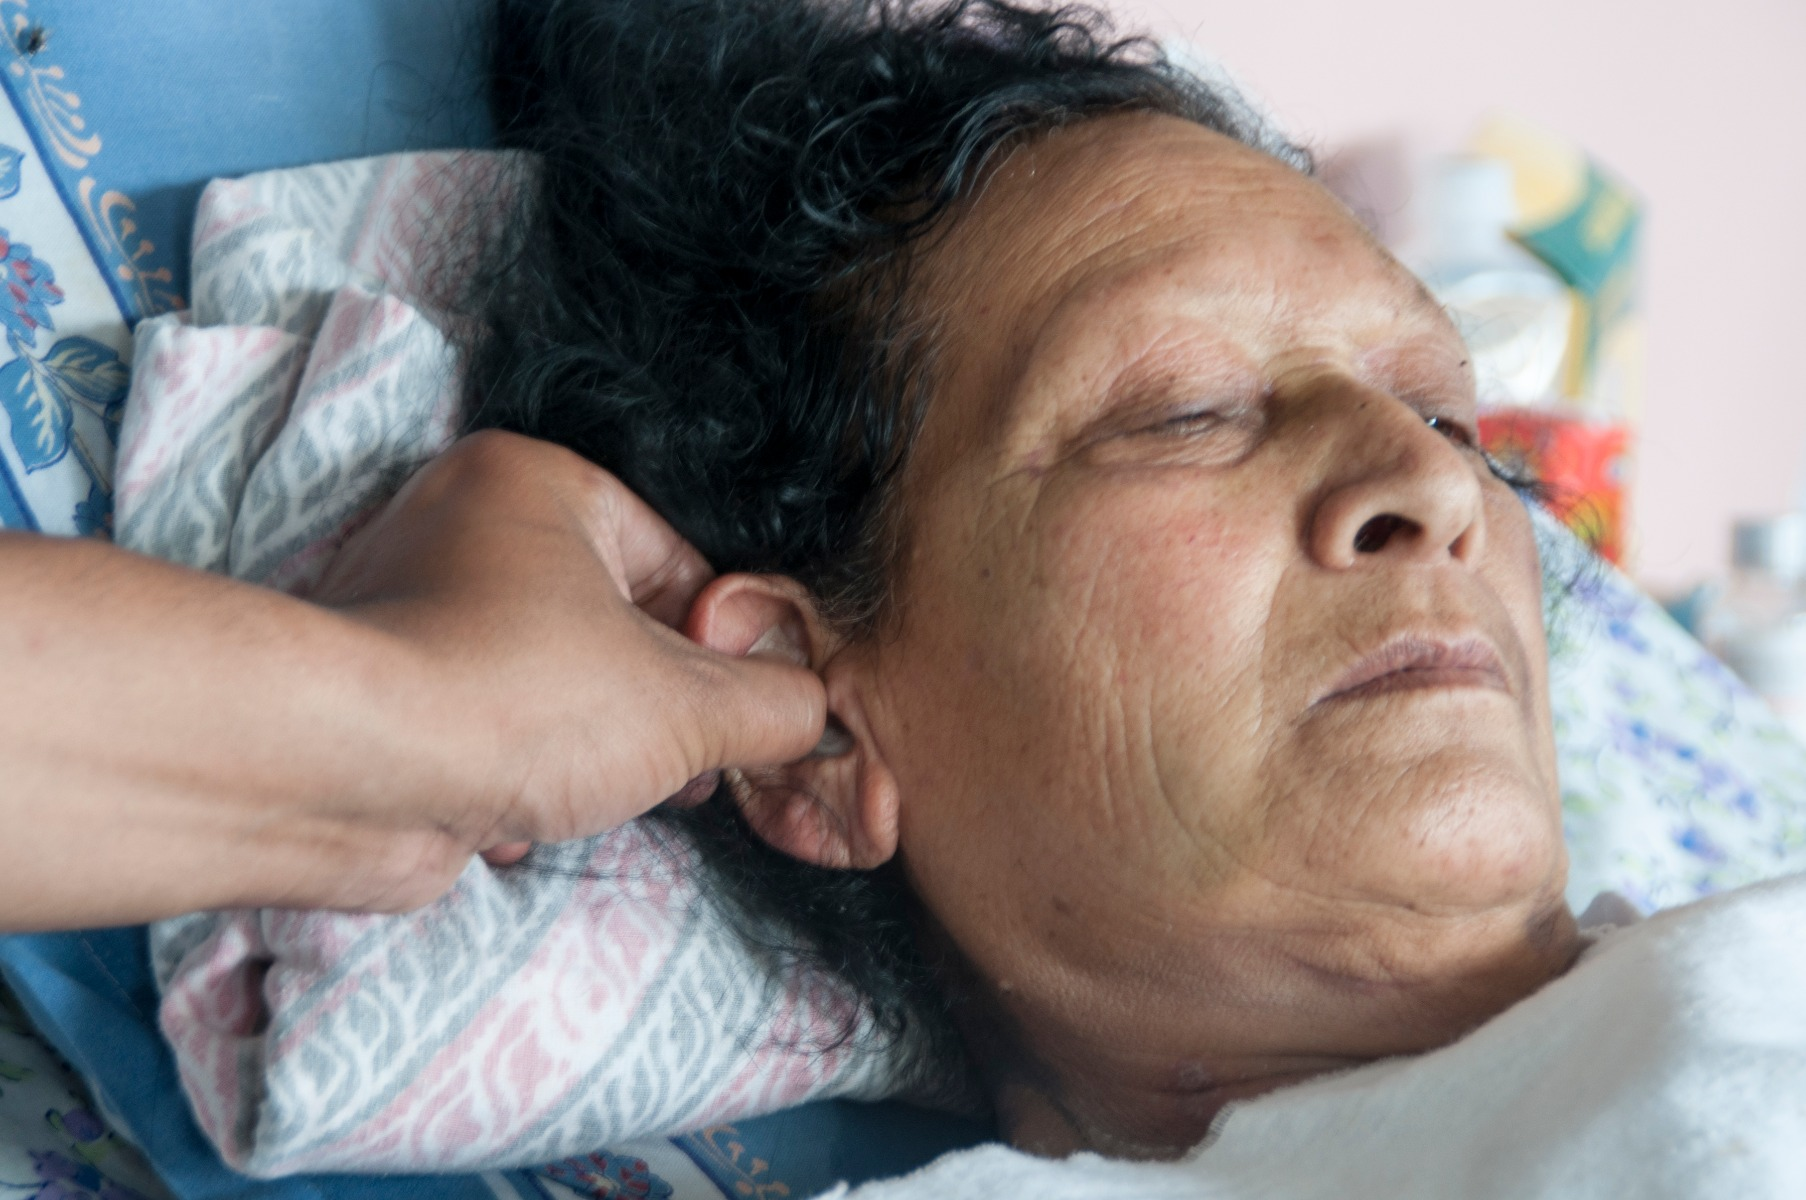 Treating at Kritipur Hospital